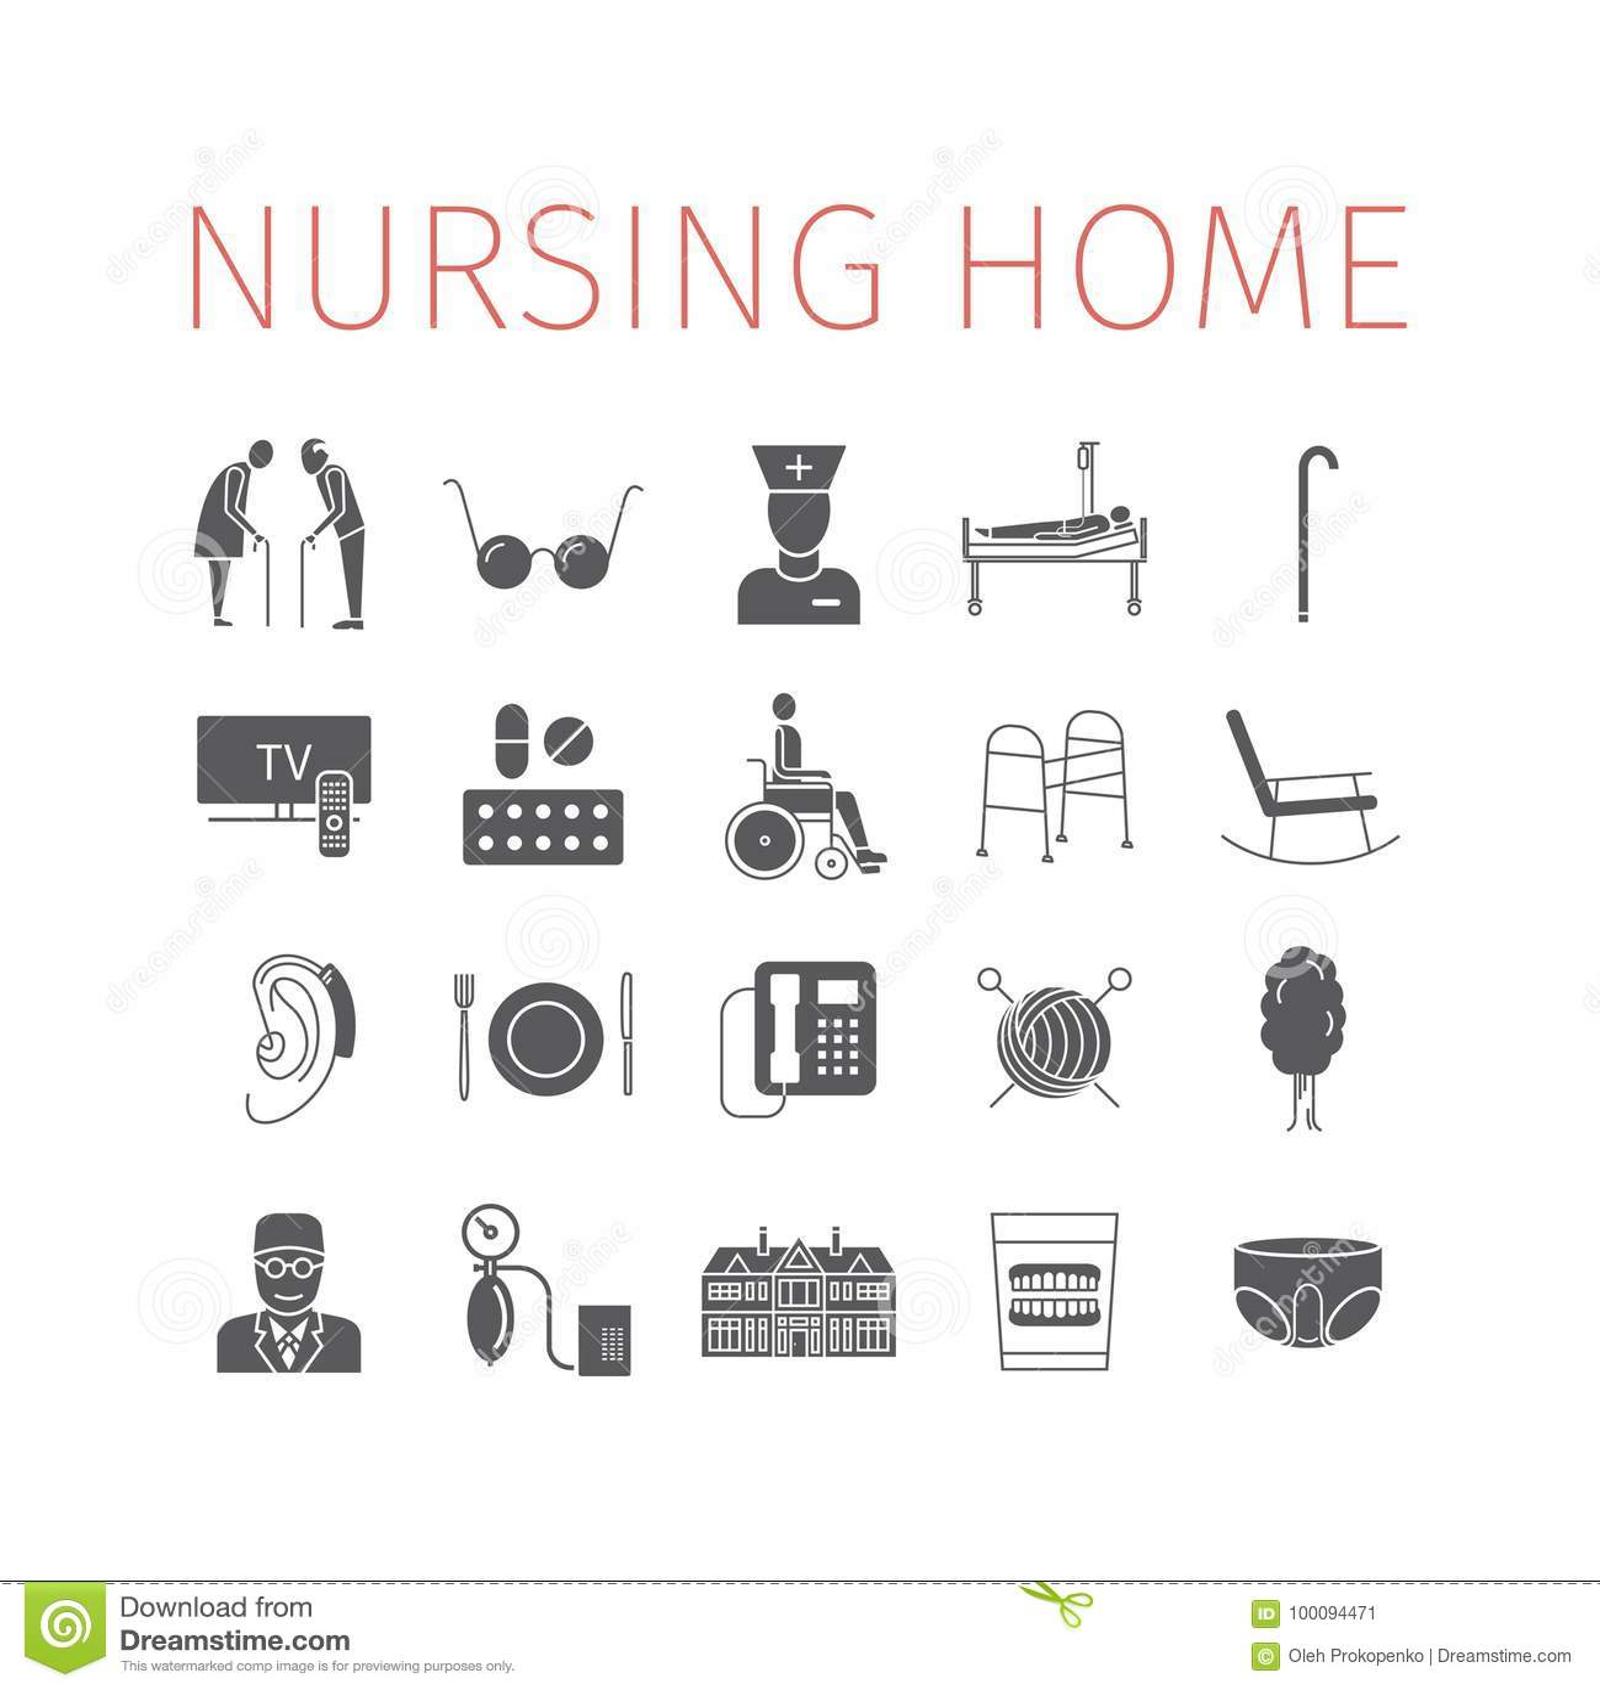 Nursing Home Icon. Medical Care For The Elderly. Symbols